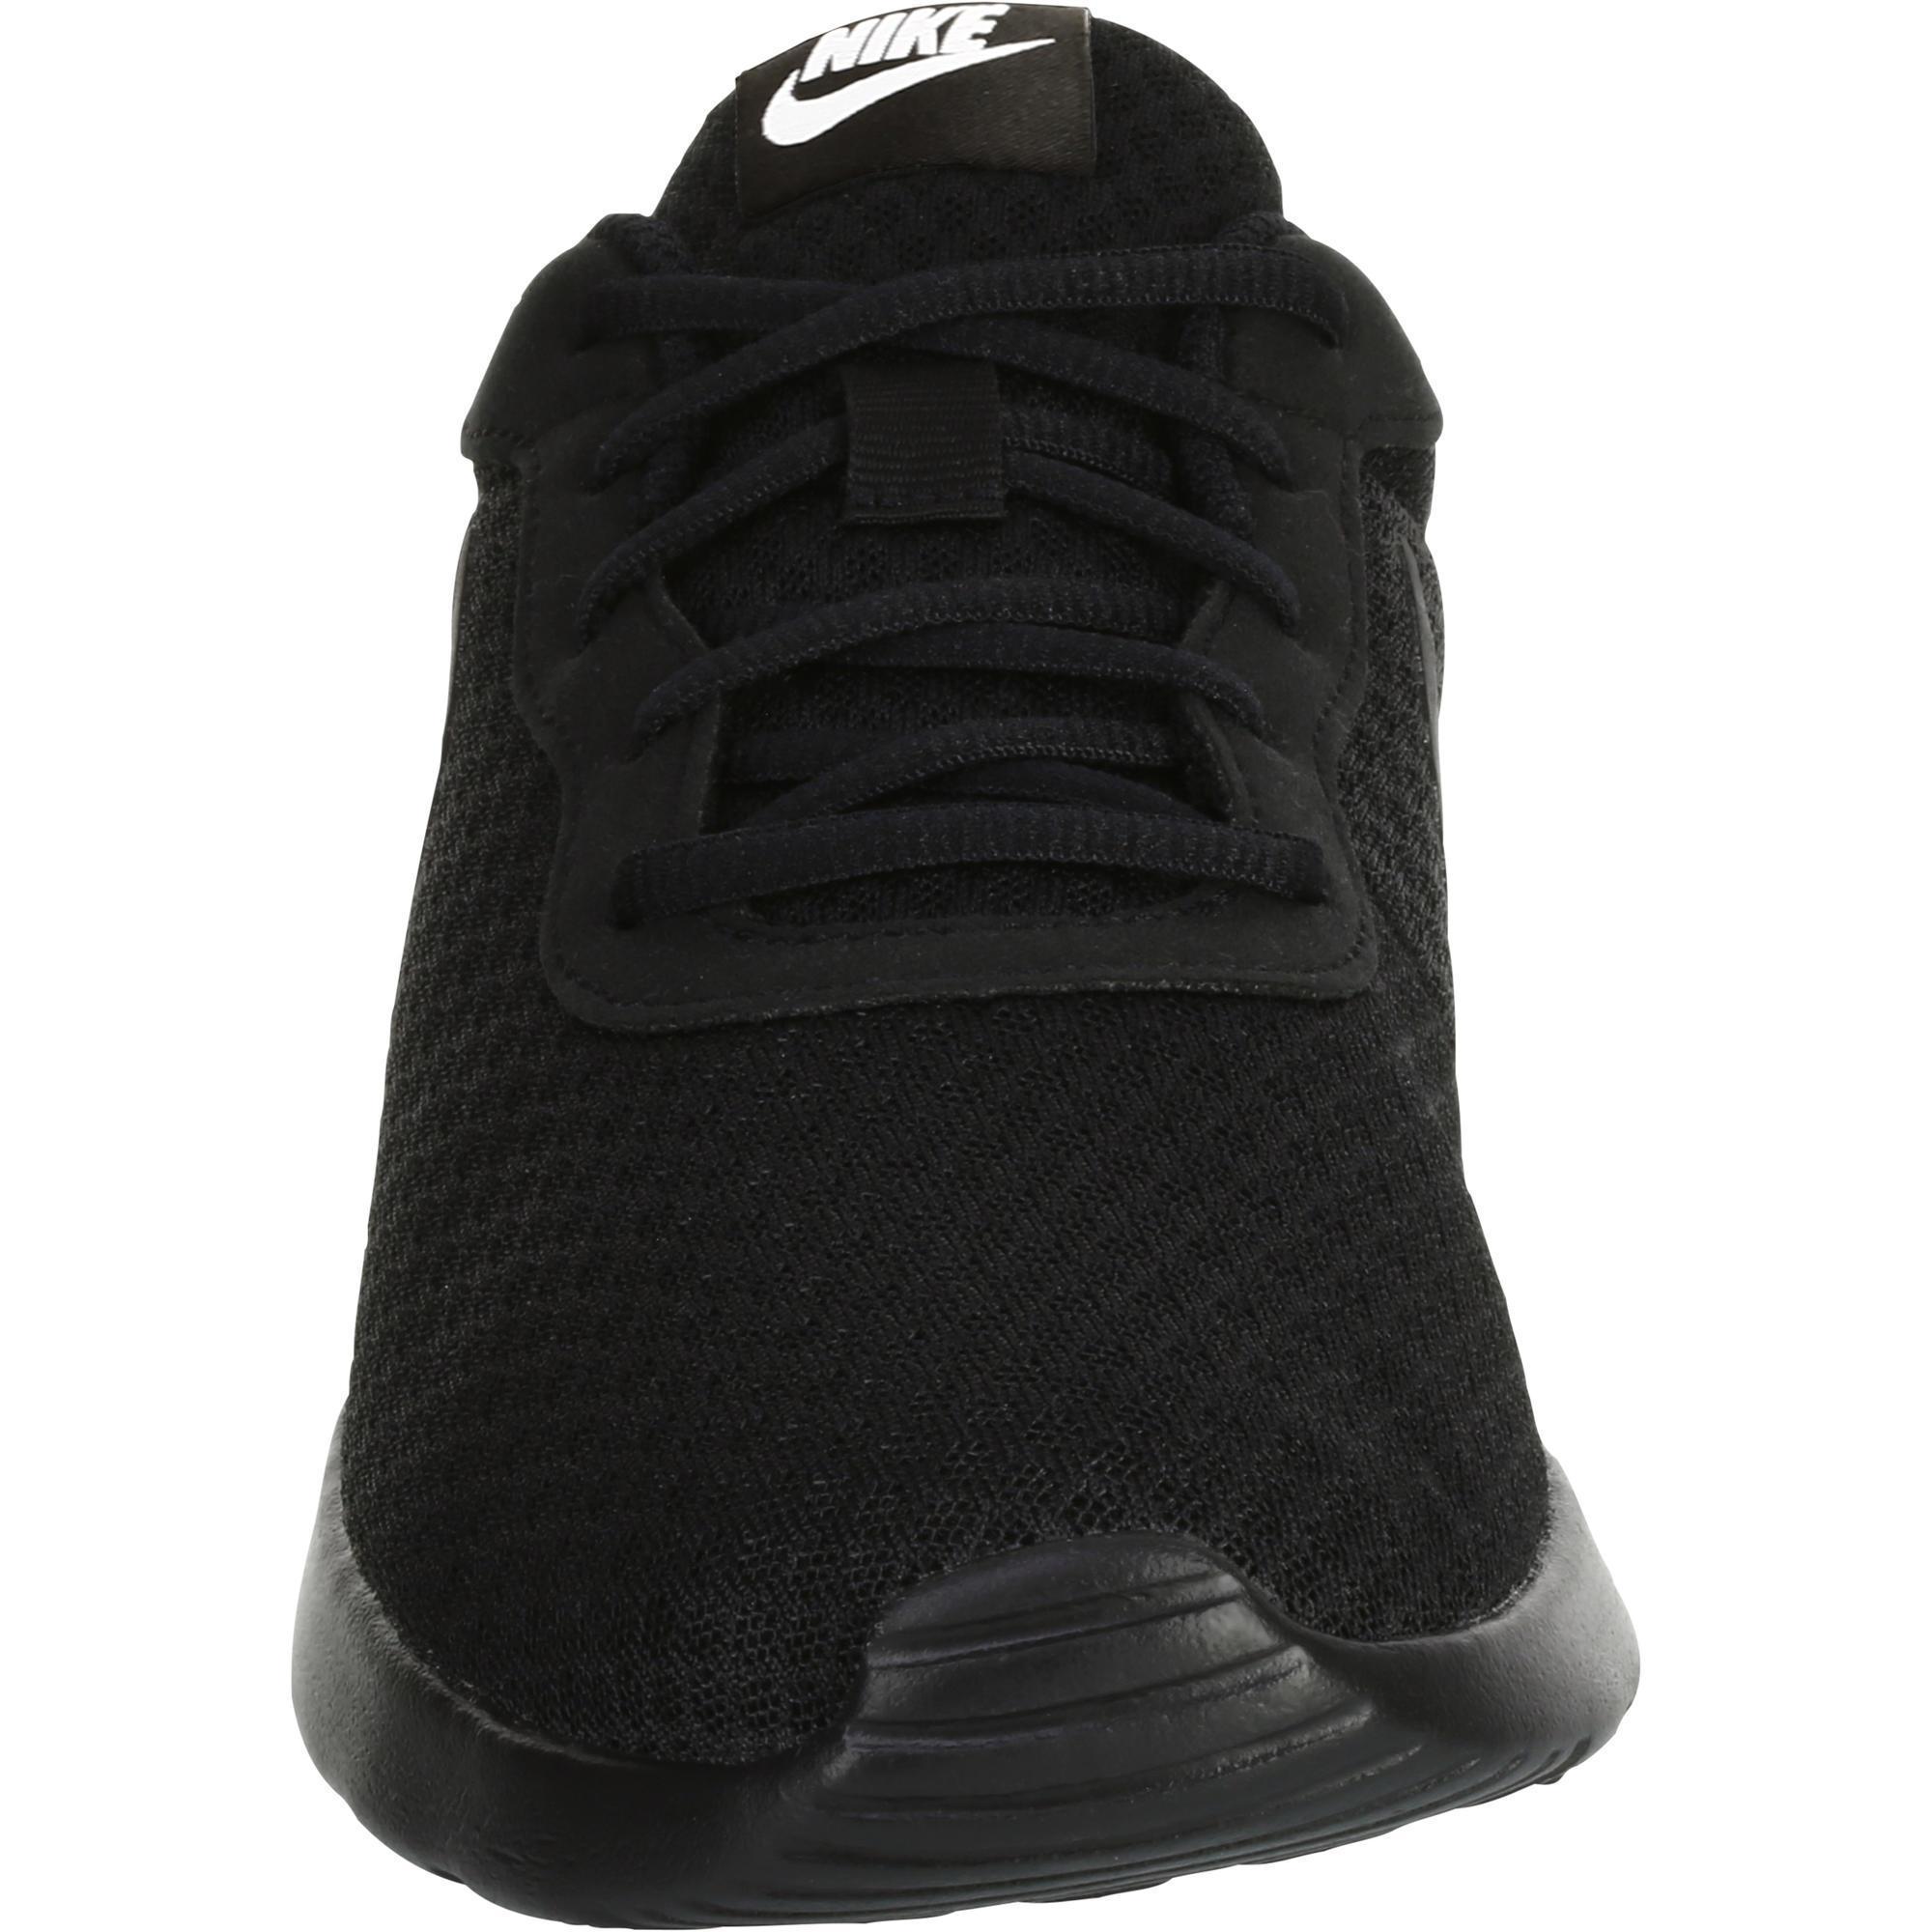 low priced 0924d 57ef8 Sportive Chaussures Femme Decathlon Noir Tanjun Marche Nike 8OwxTqPT